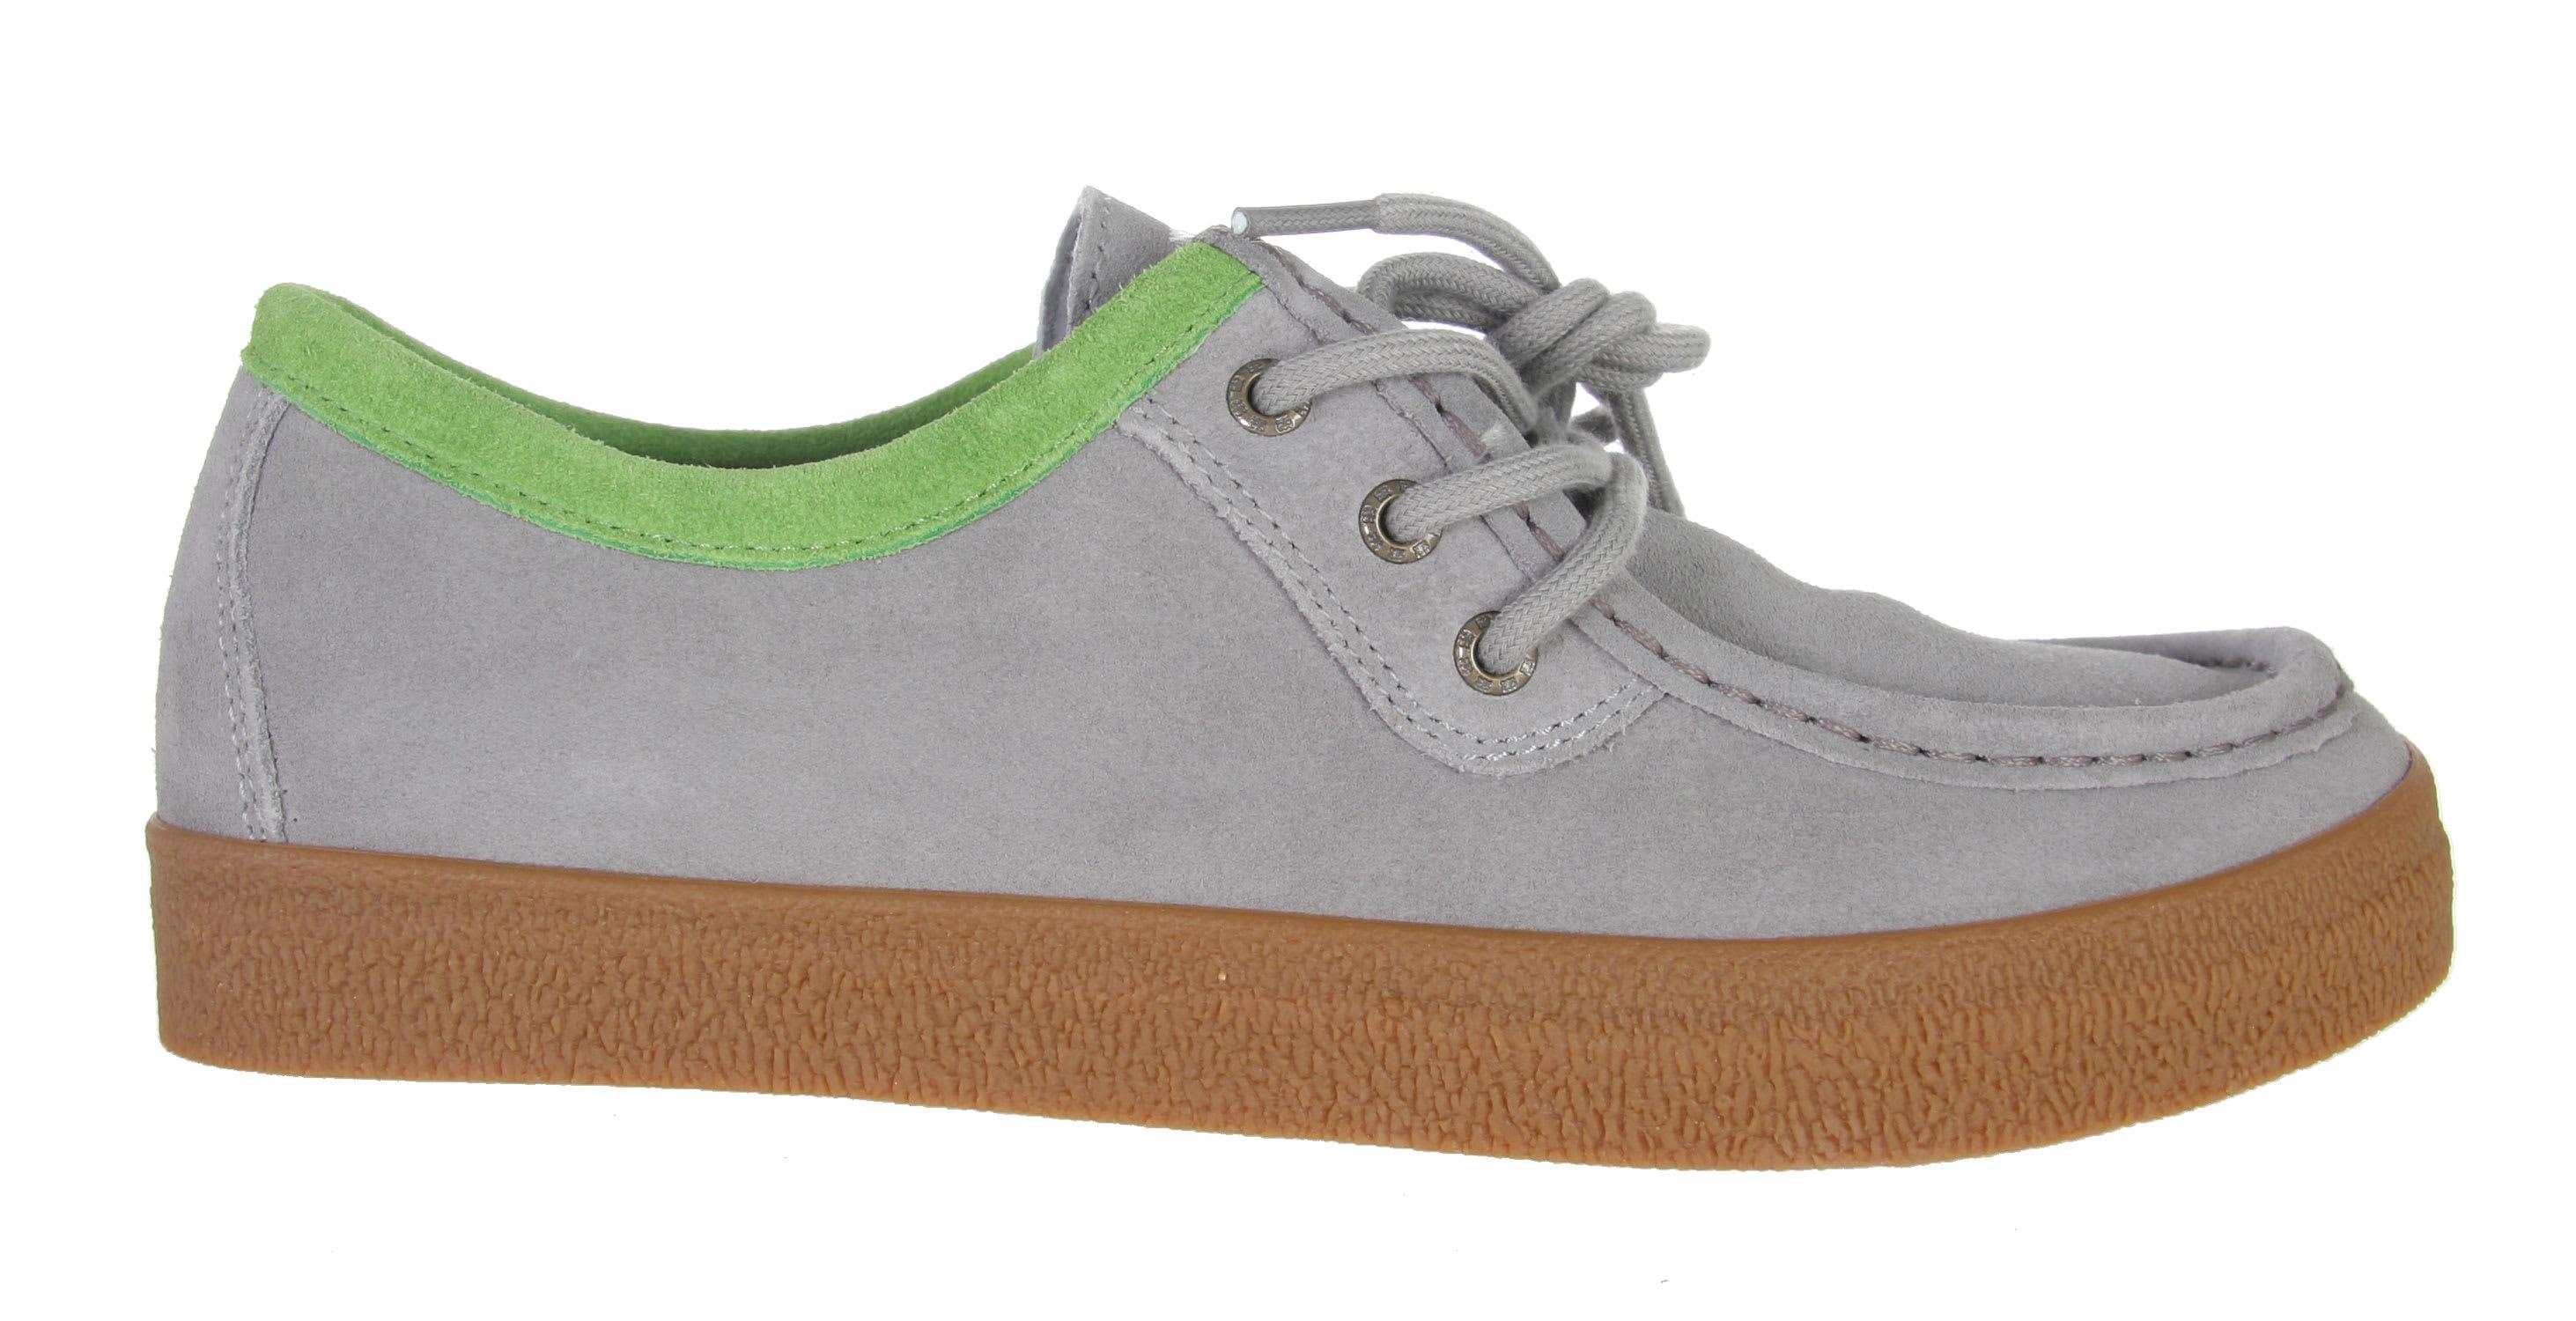 88aea2f1fb Ipath Cat Low Skate Shoes - thumbnail 1